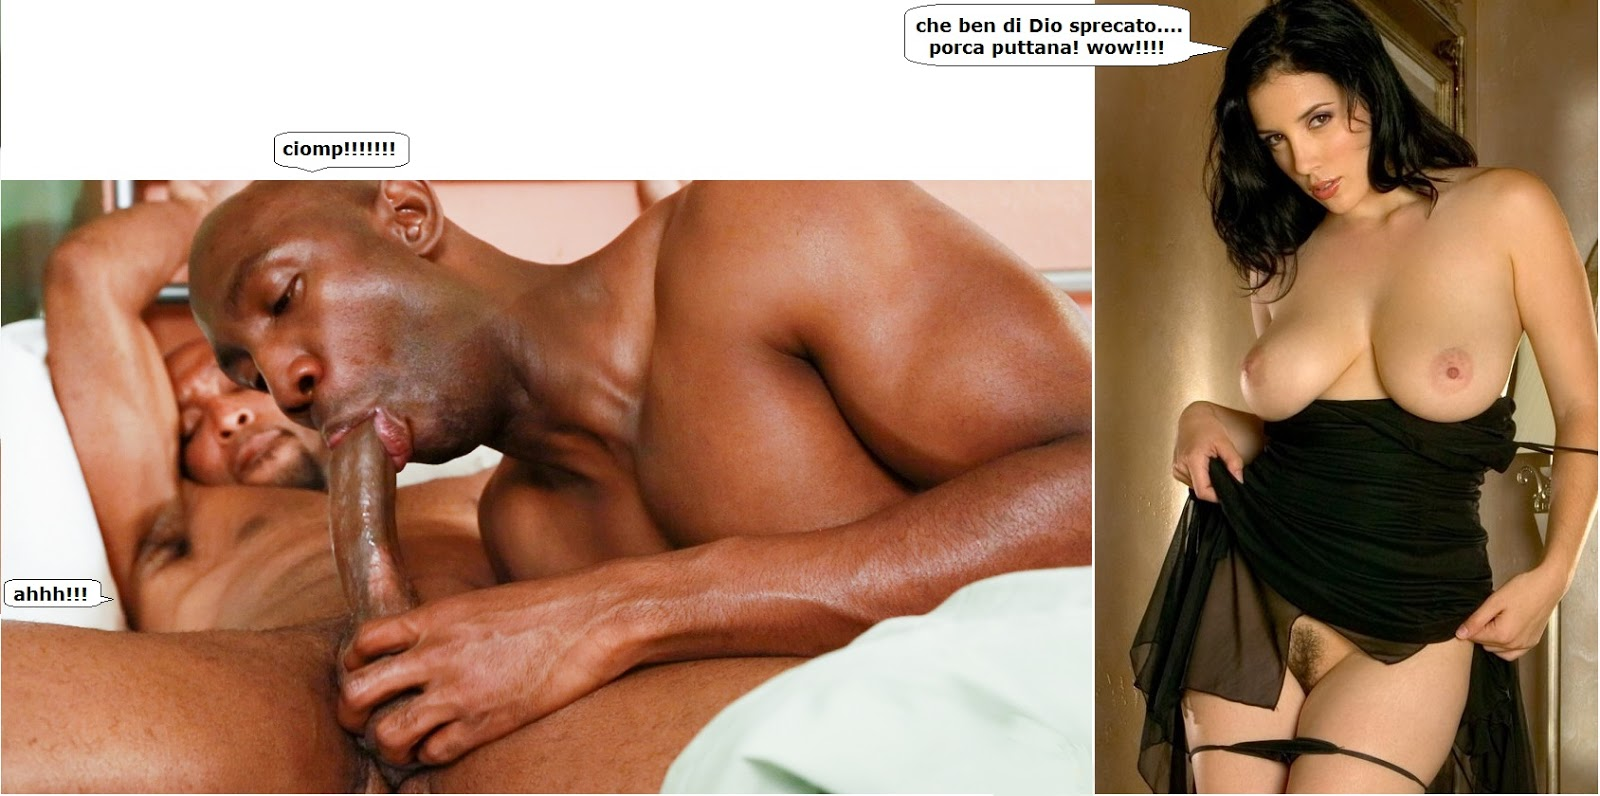 escort gay brescia massaggi happy milano